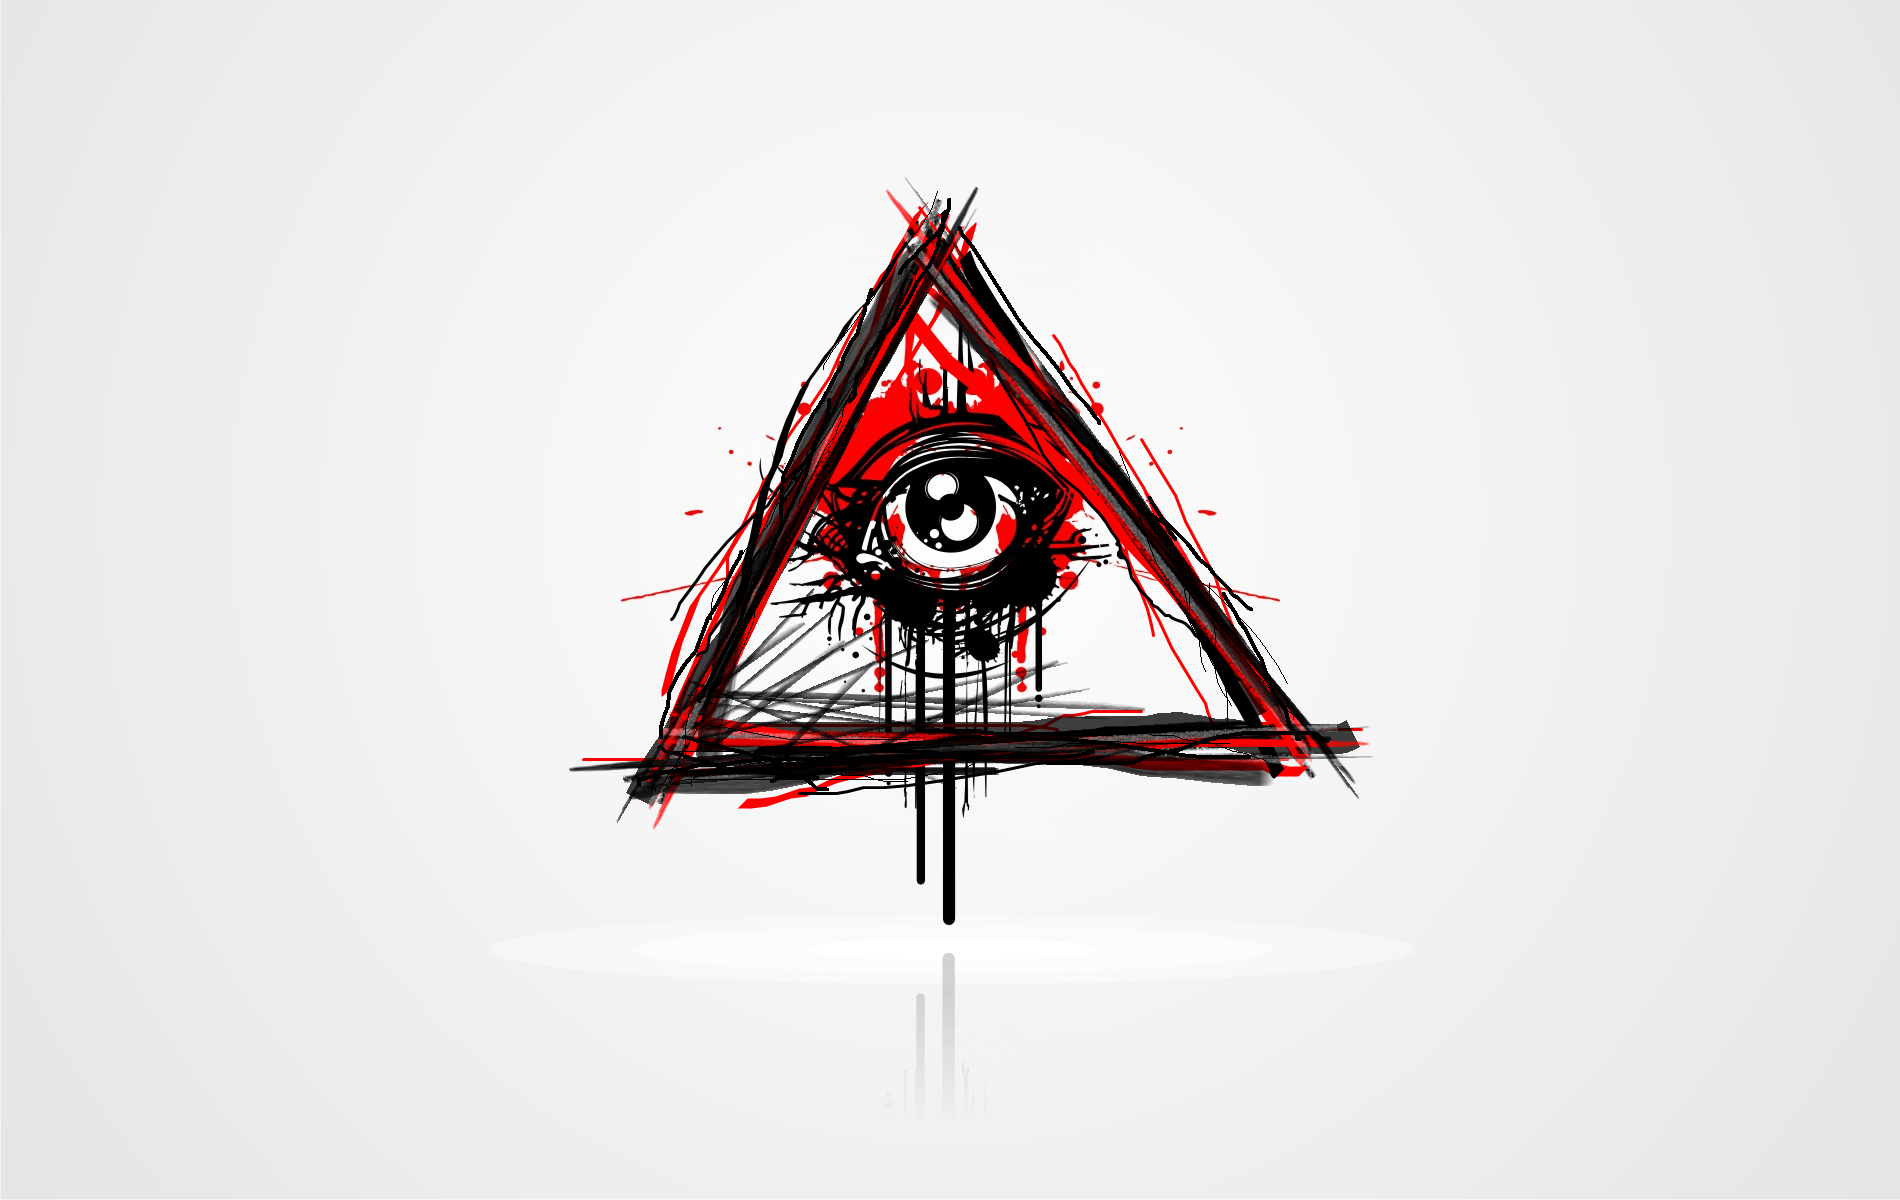 illuminati symbol wallpaper 1920x1080 - photo #27